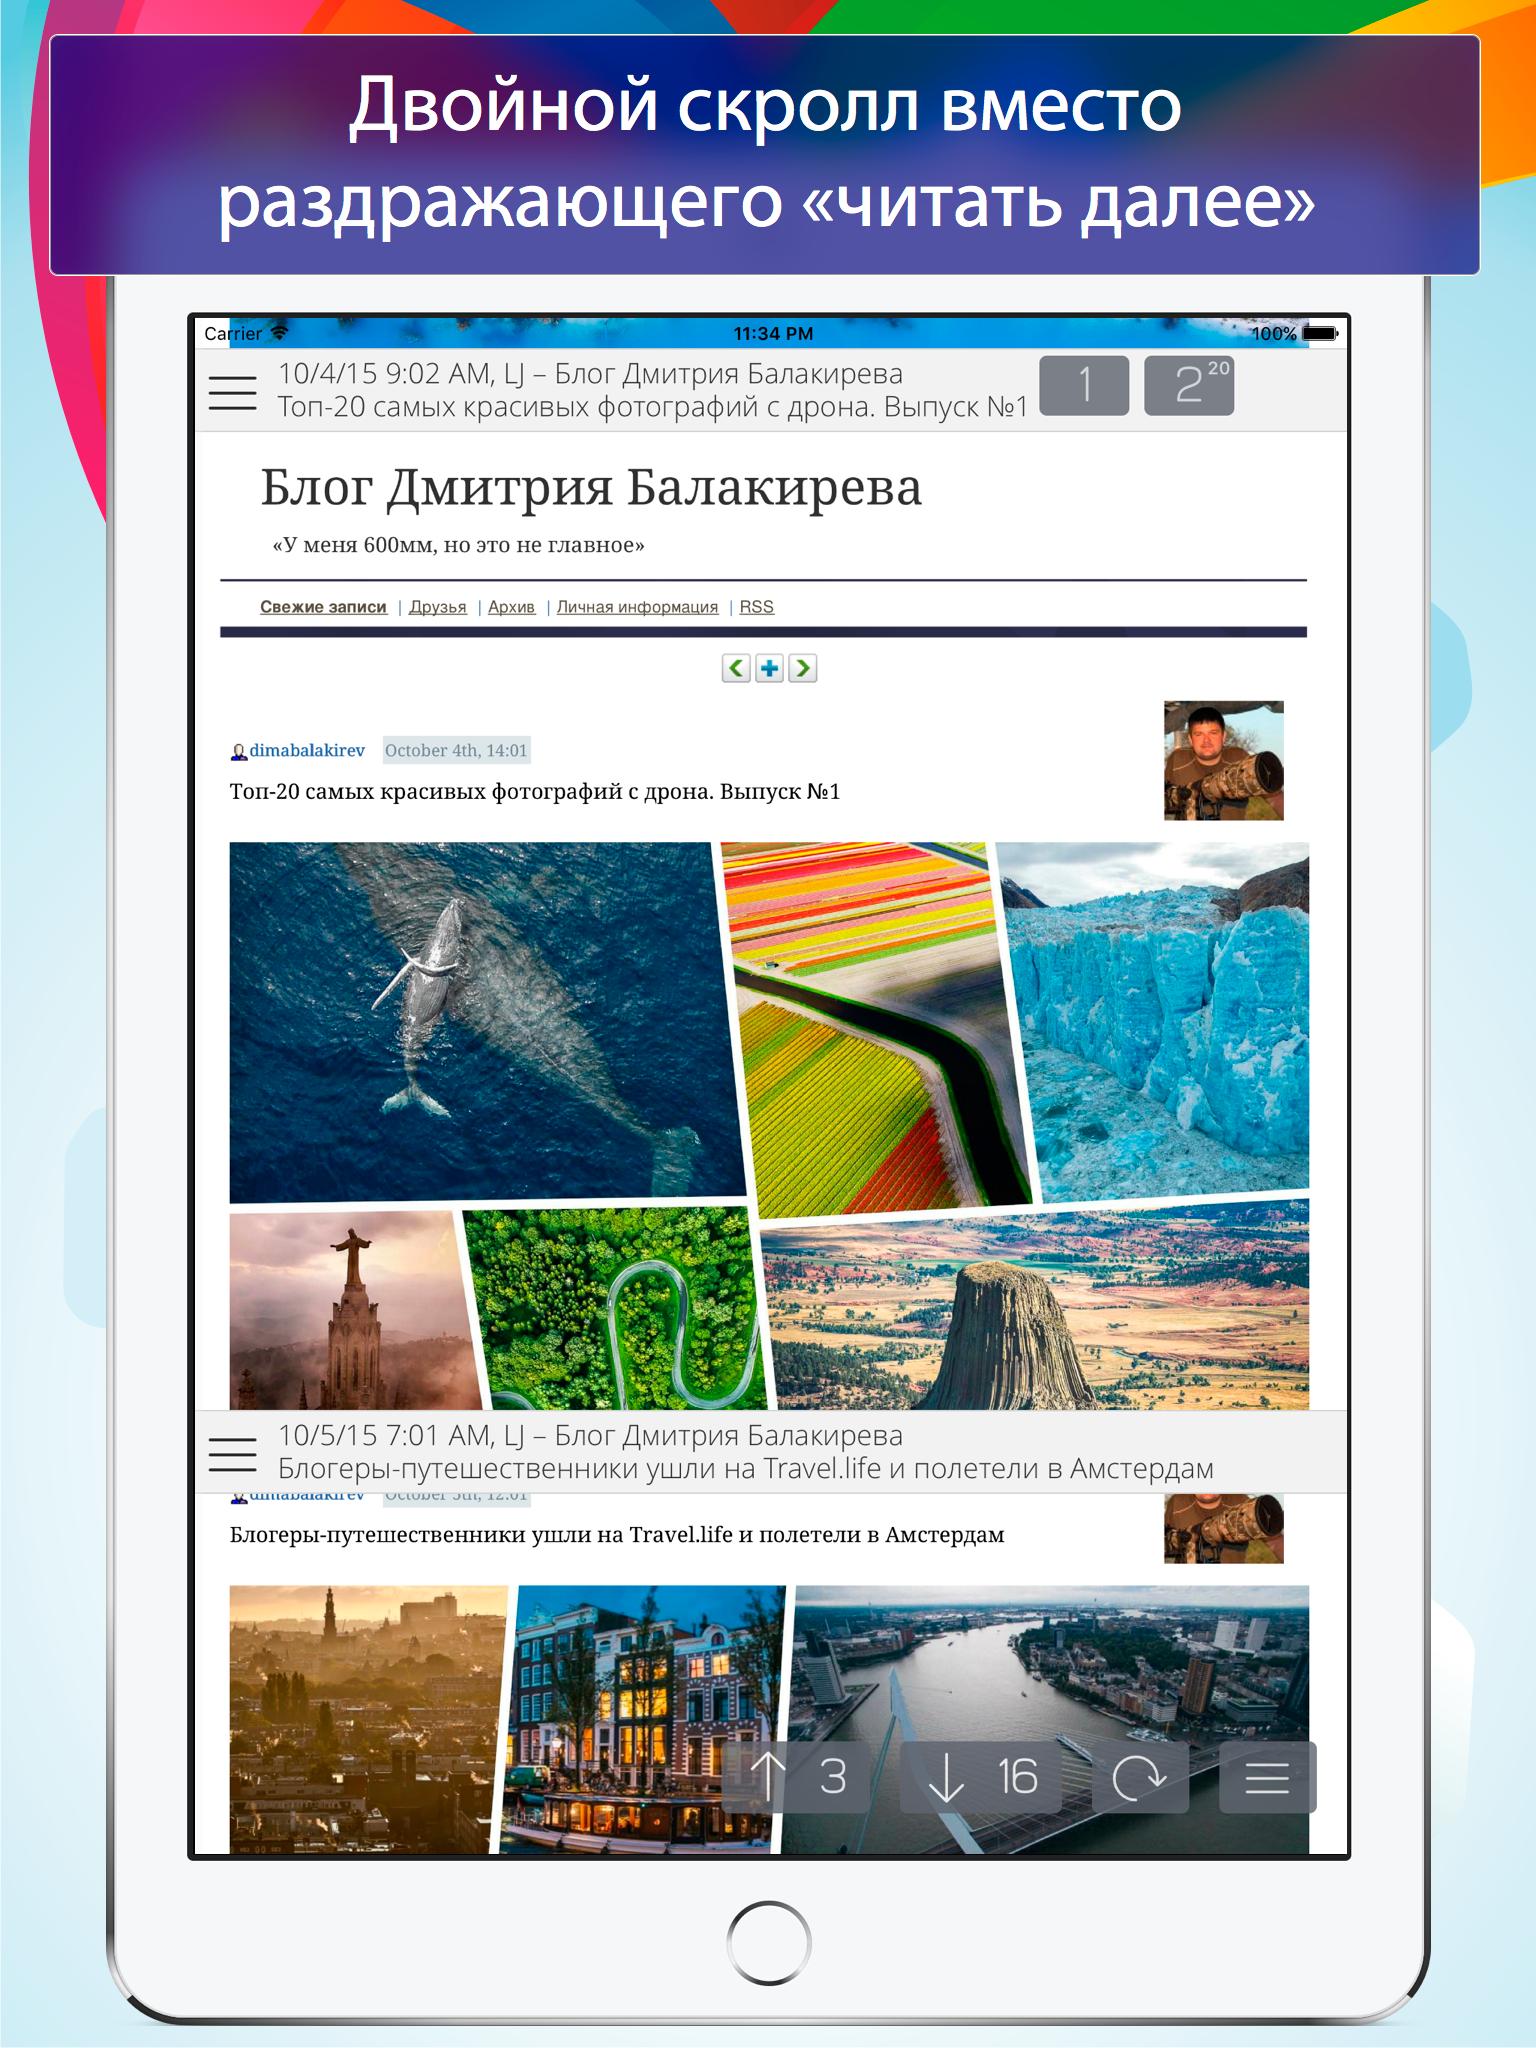 Офлайн-браузер Мегалента показал альтернативу традиционному веб?сёрфингу